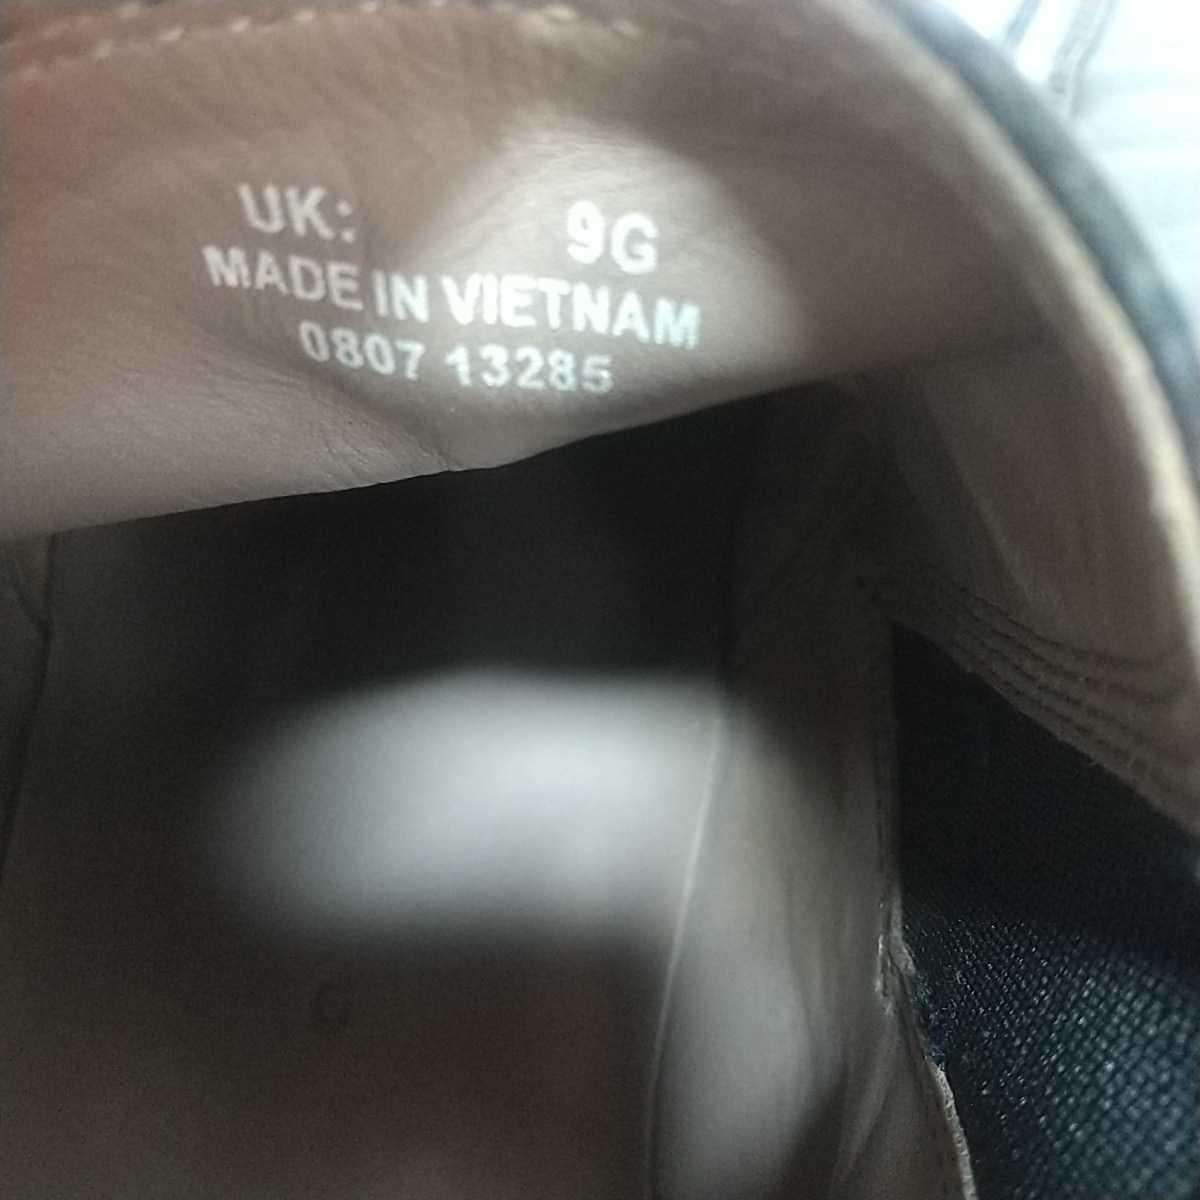 Clarks クラークス レザー サイドゴアブーツ ショート UK9 27.5cm 黒 ブラック 革靴 _画像8